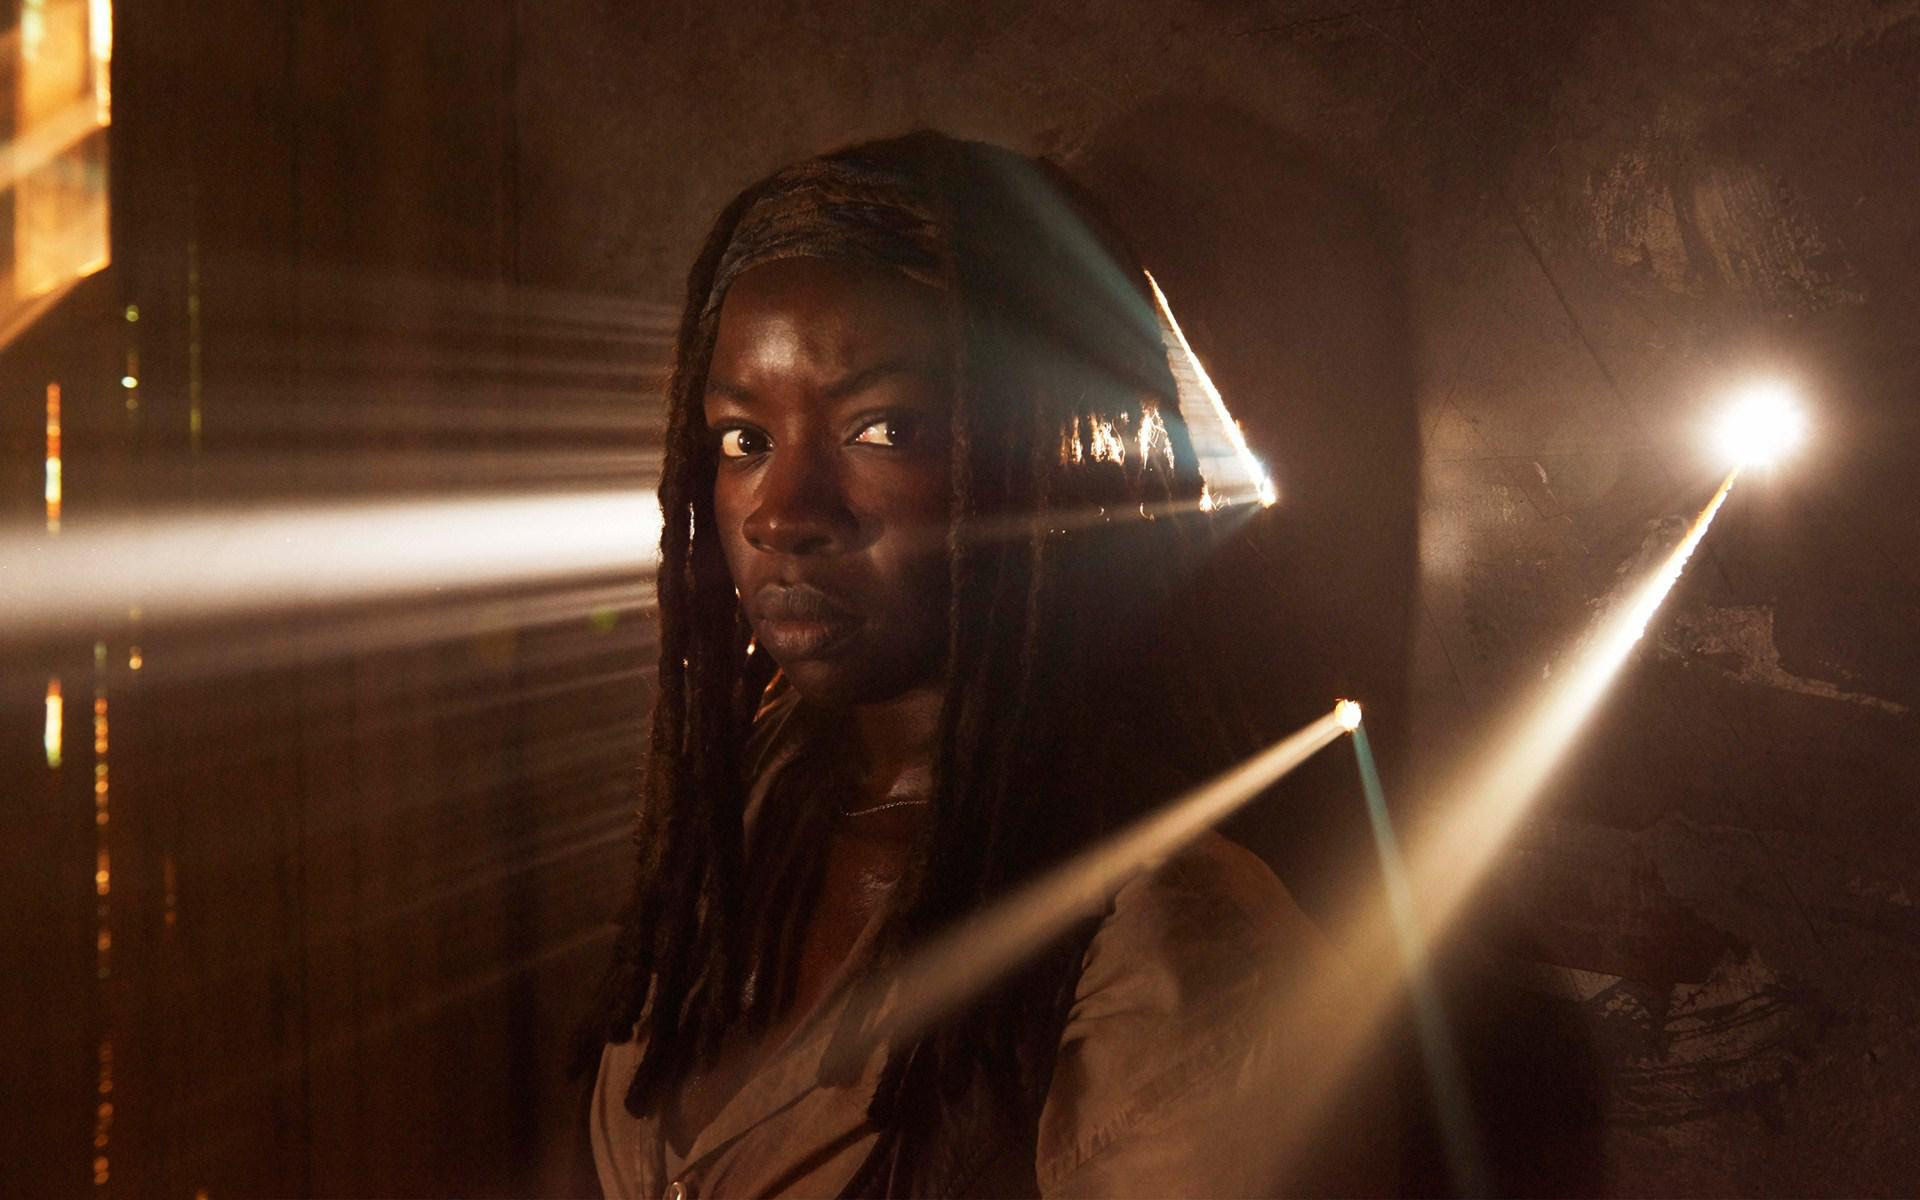 Hd Danai Gurira In The Walking Dead Season 5 Hd Wallpaper